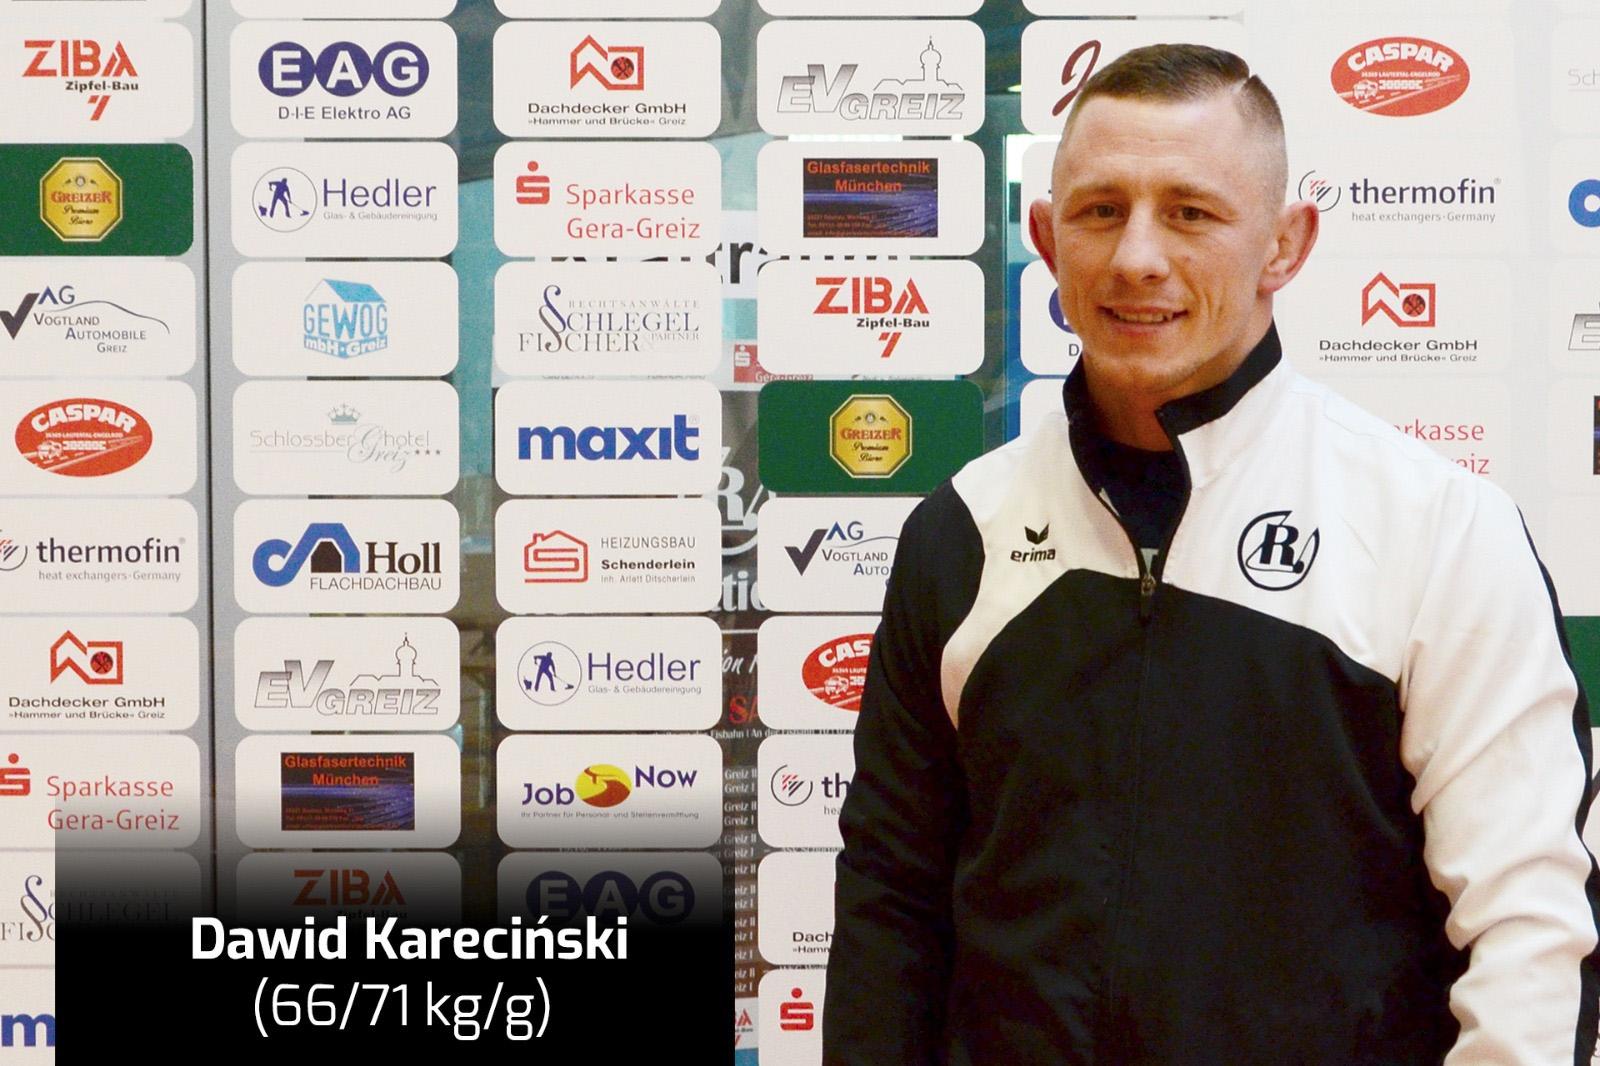 Dawid Karecinski